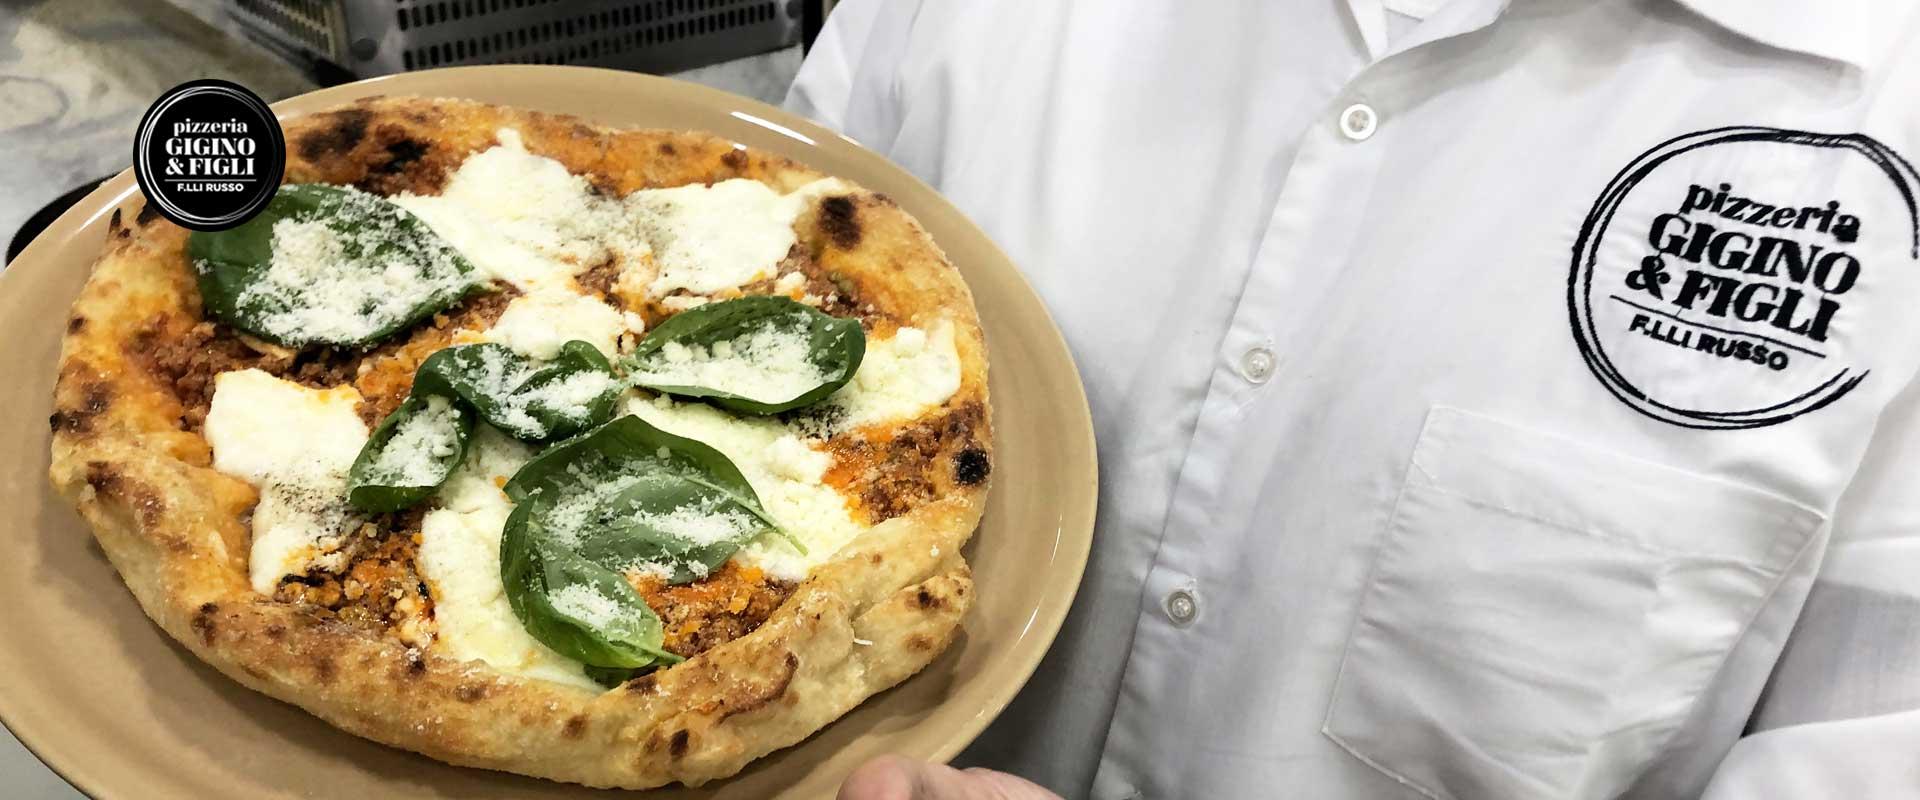 Pizza montanara alla bolognese